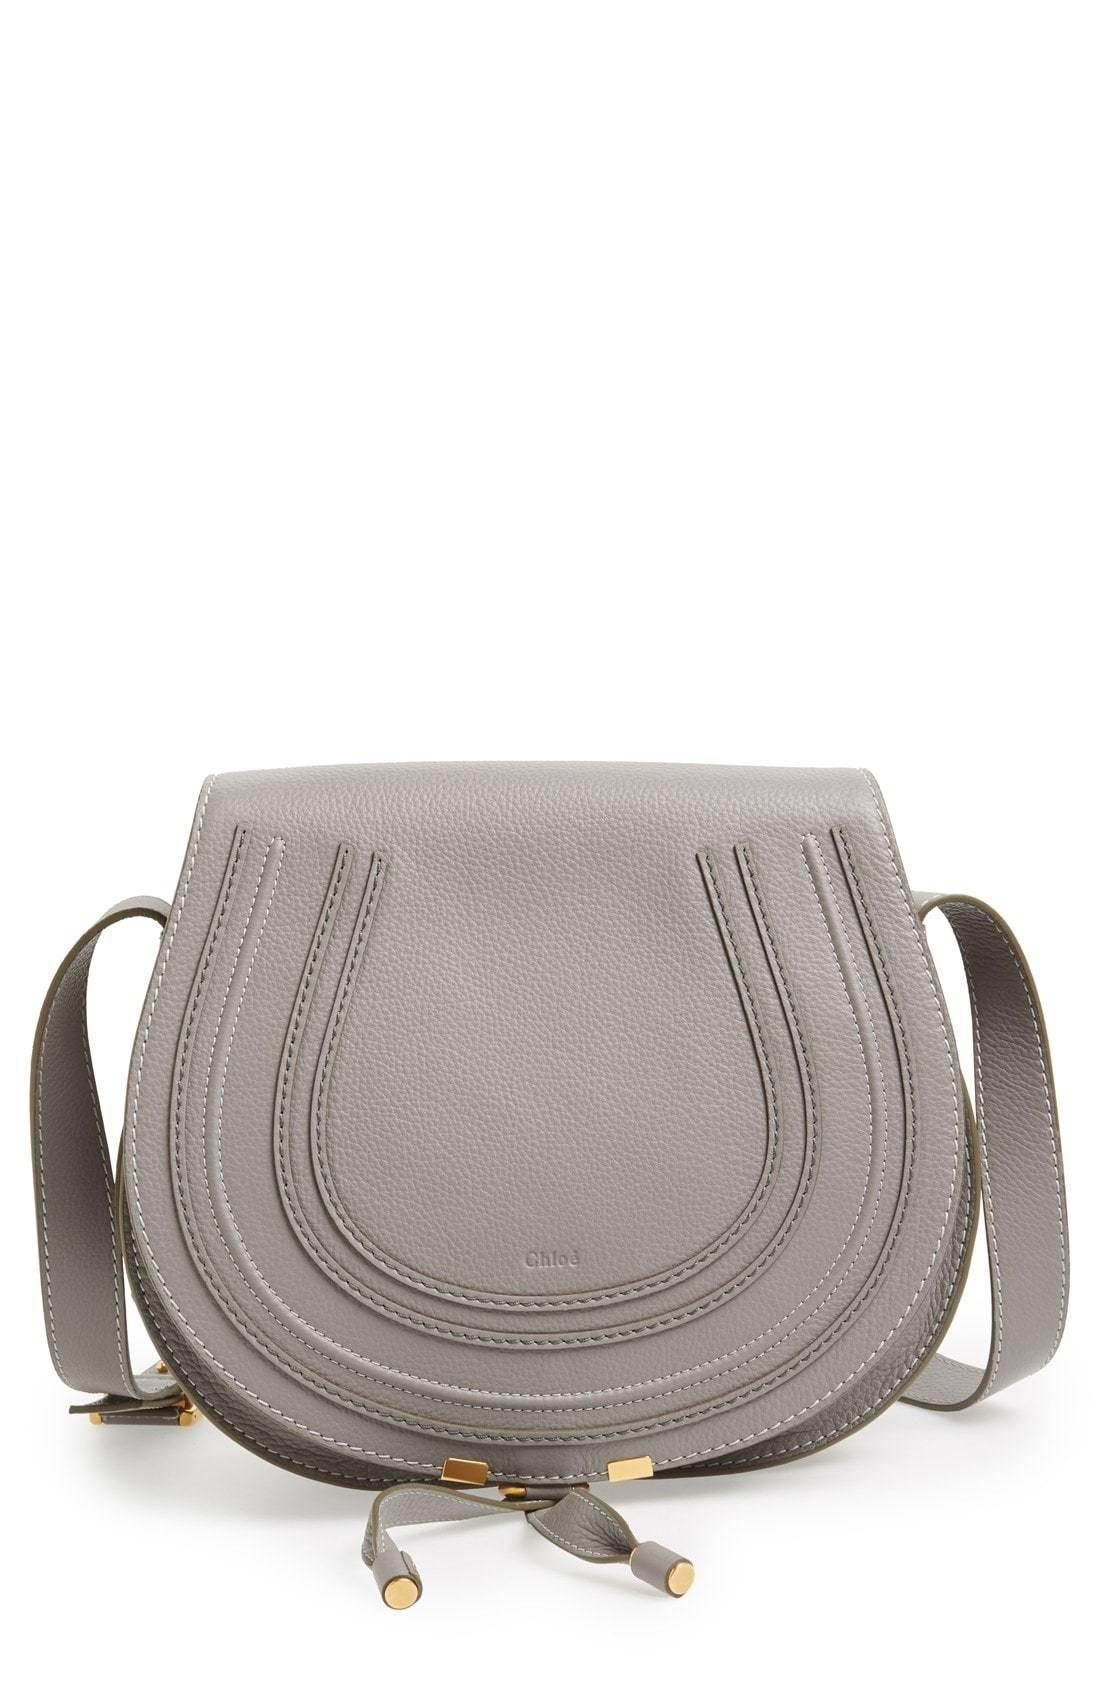 91ce18d06dd Chloé Marcie Medium Leather Crossbody Bag, $1,490 | Nordstrom ...